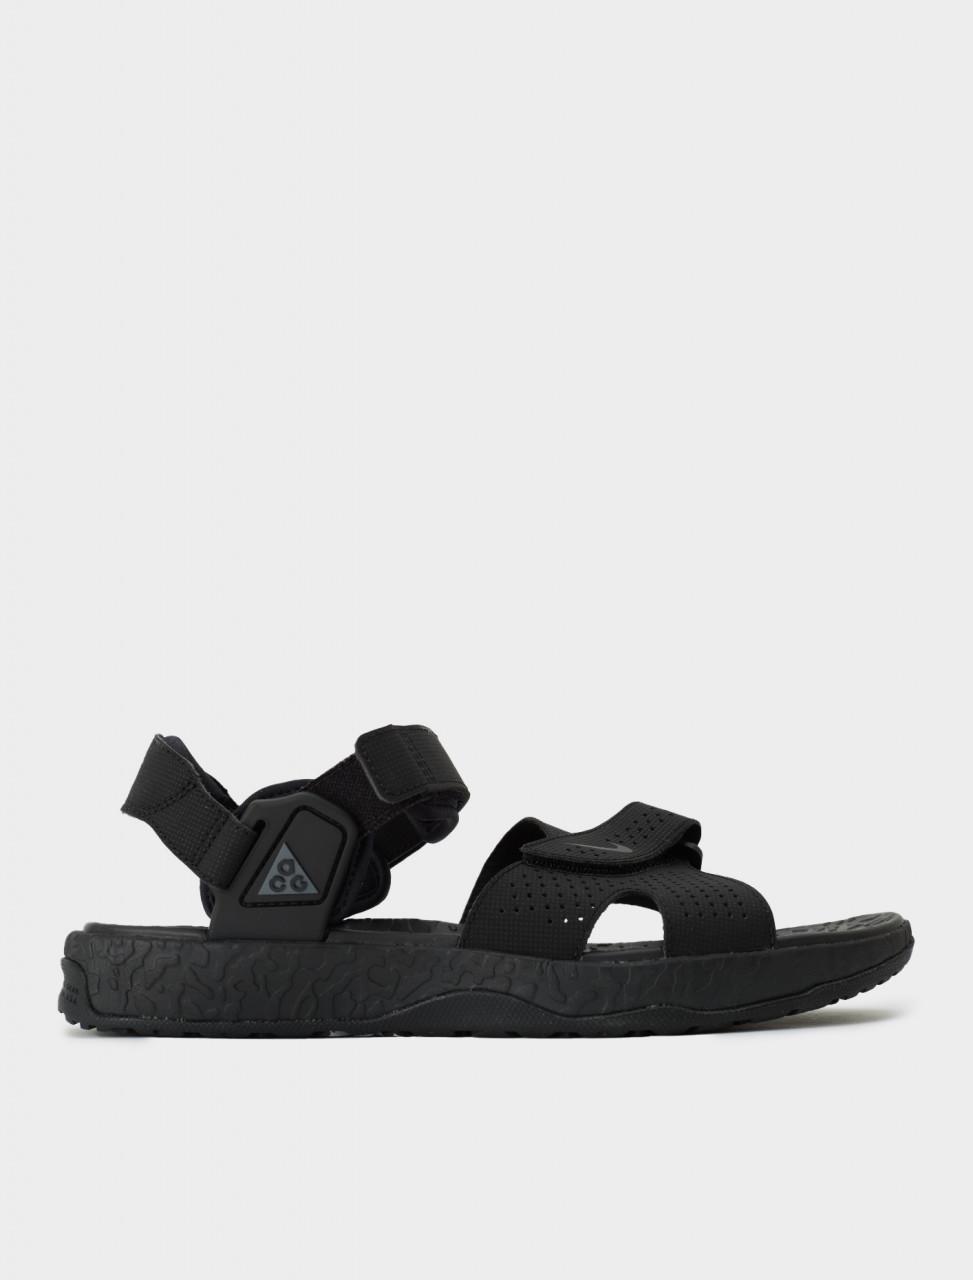 Nike ACG Deschutz Sandal in Off Noir & Iron Grey